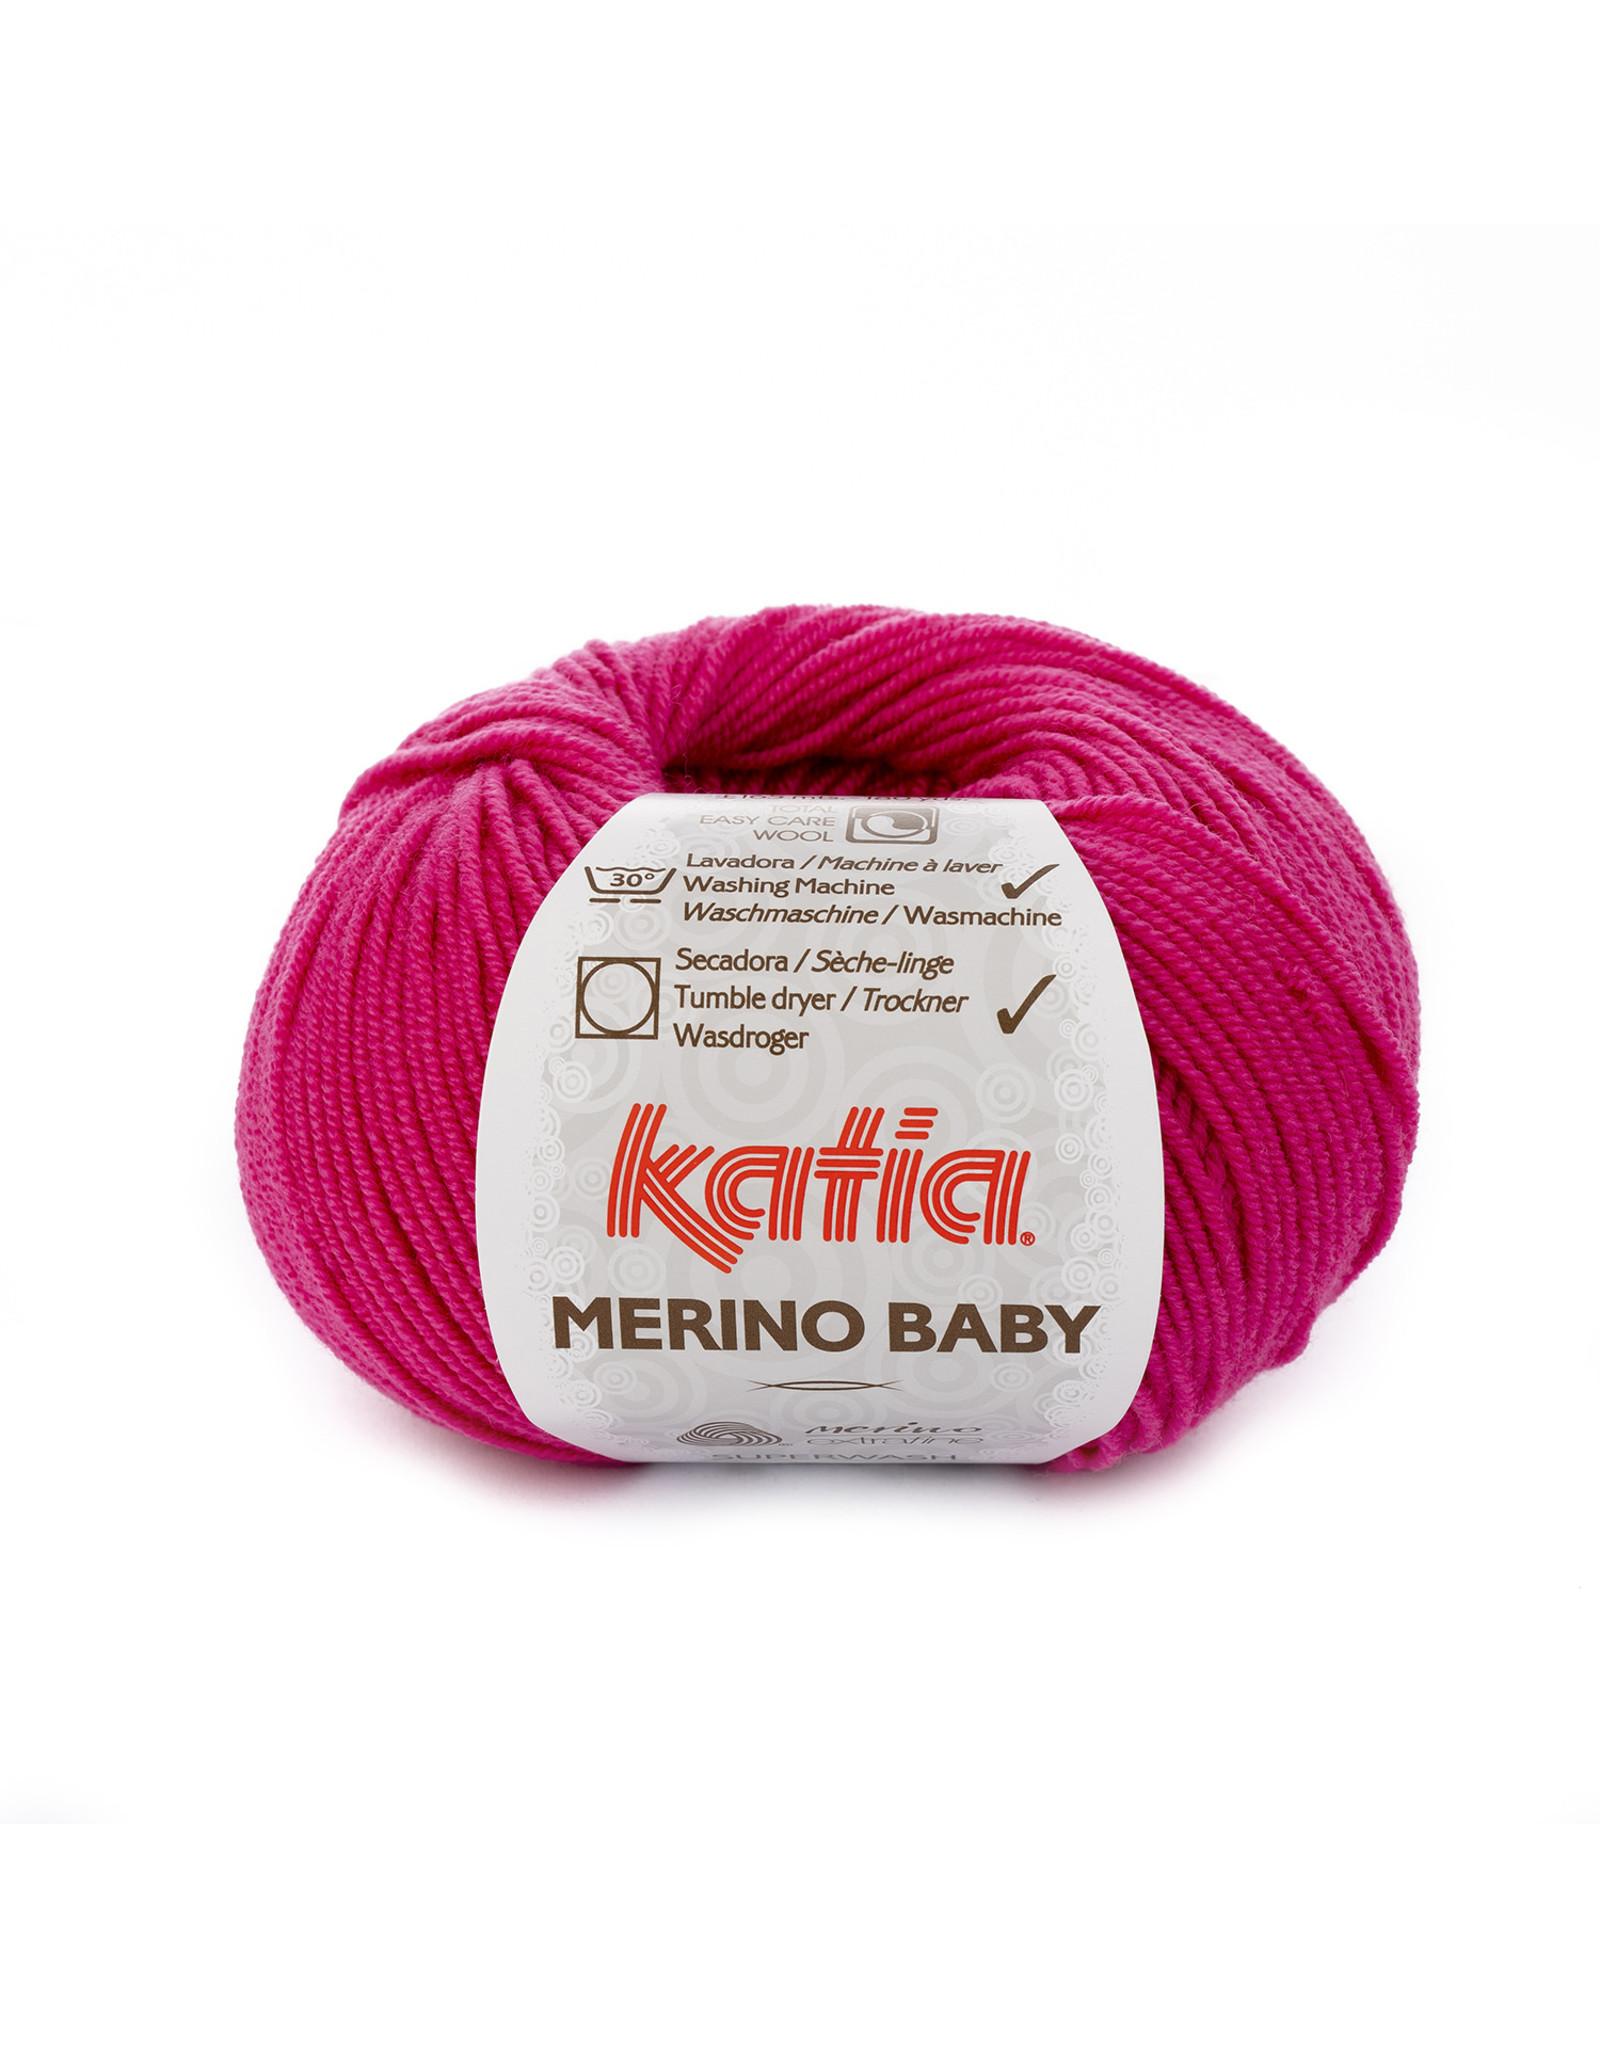 Katia Katia Merino Baby - 60 fuchsia - 50 gr. = 165 m.